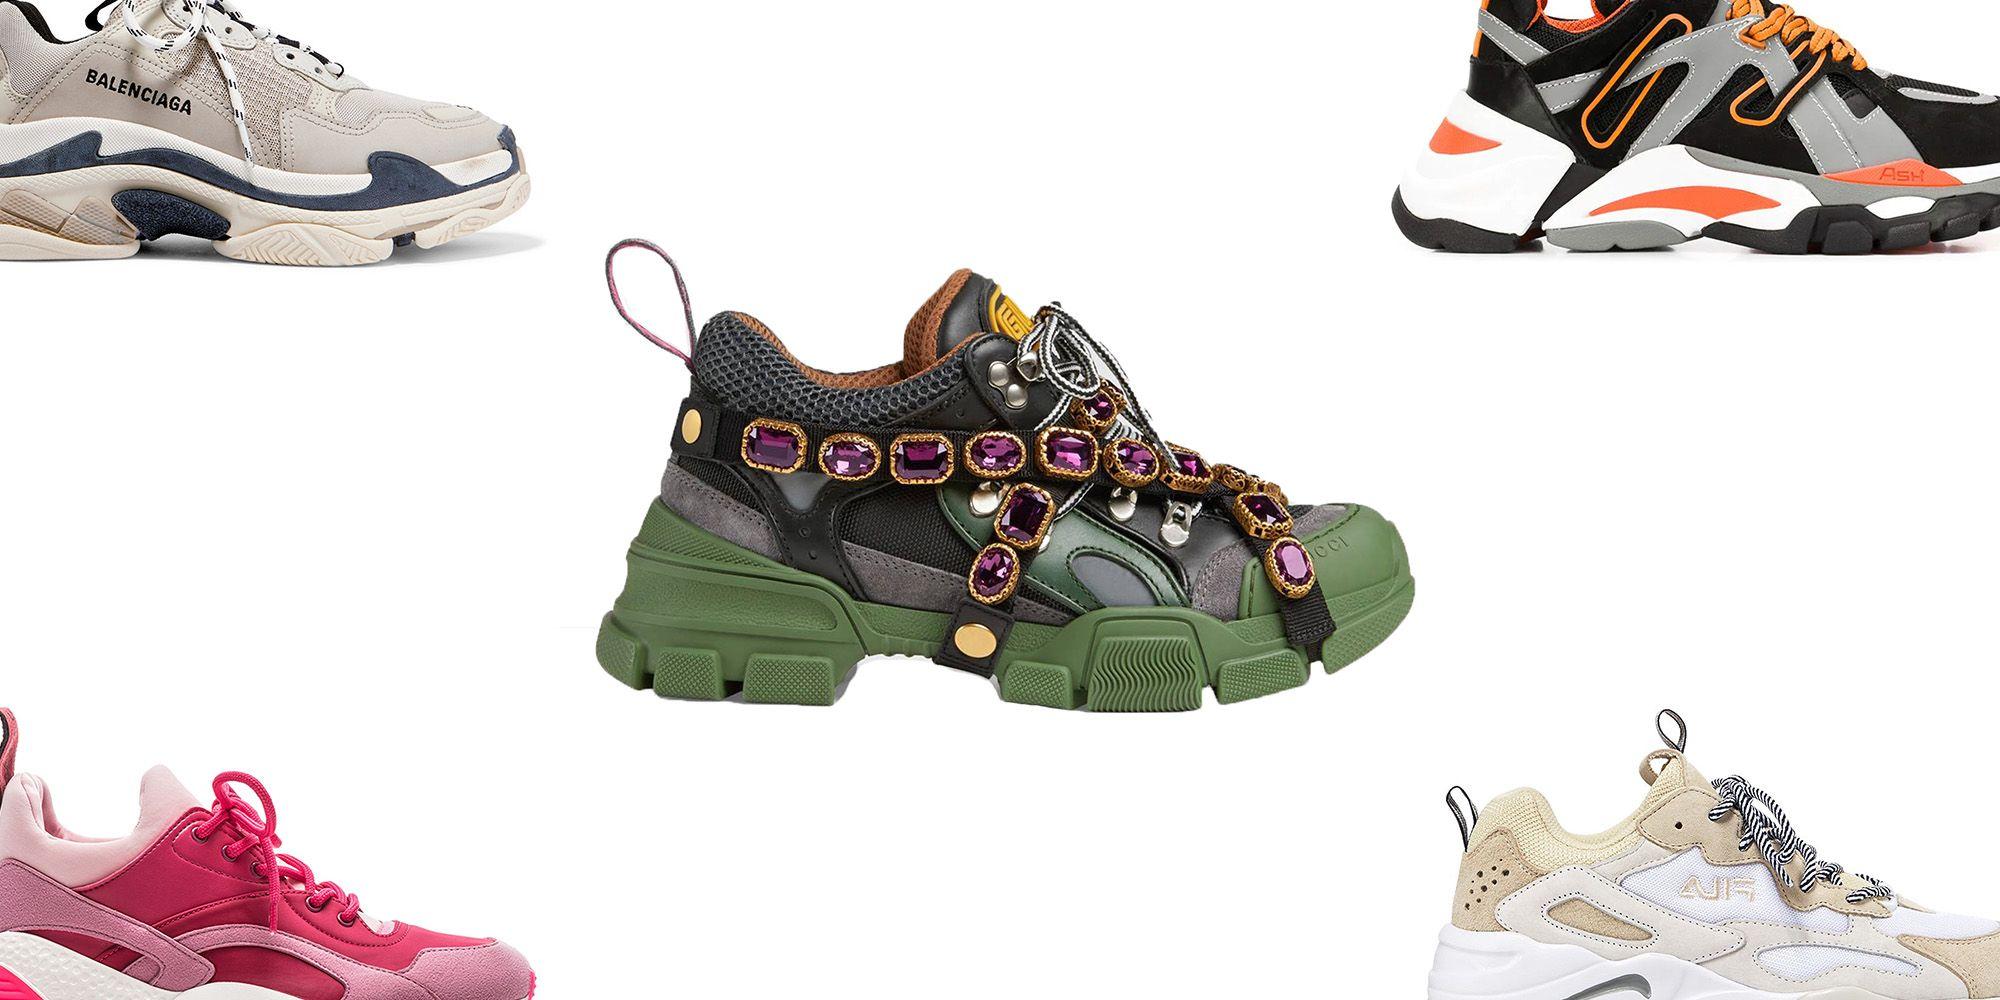 Wear Trend Ugly To Sneaker Sneakers Best How The 5LR4j3qA